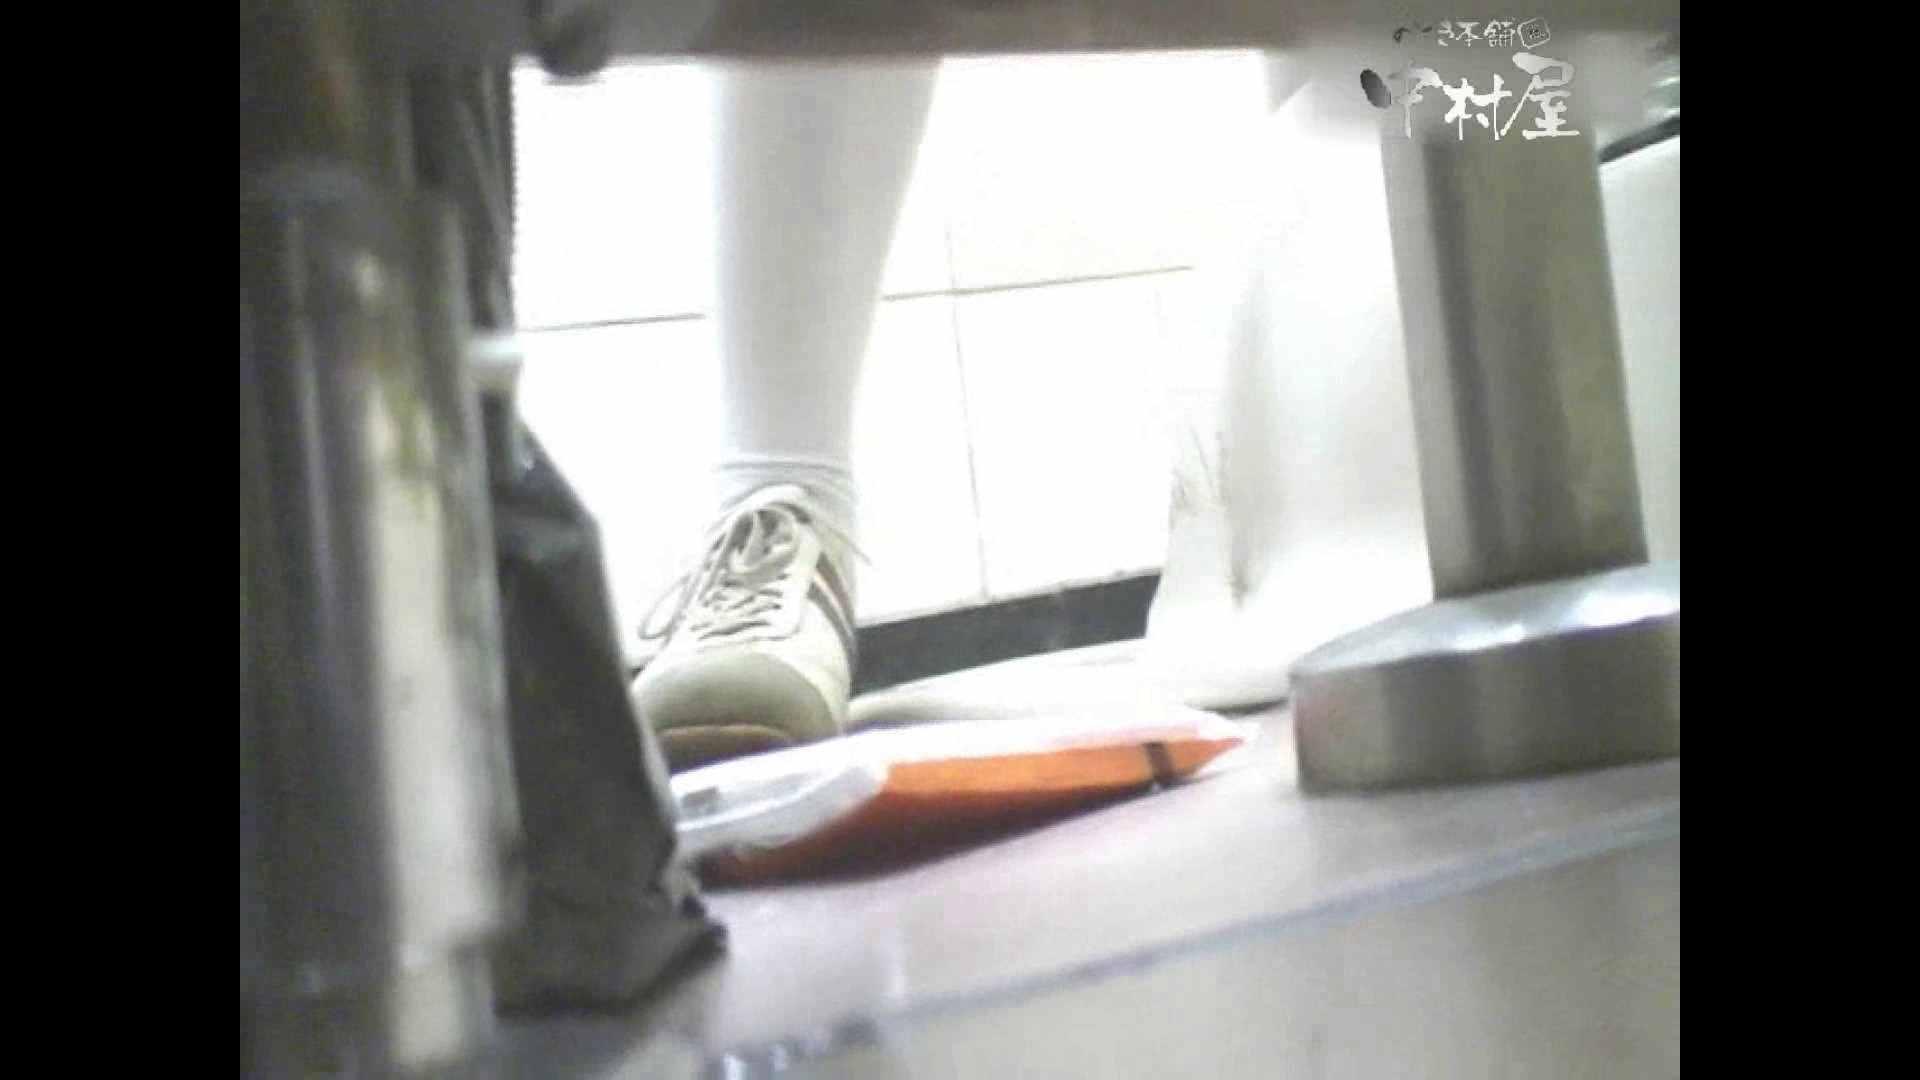 岩手県在住盗撮師盗撮記録vol.29 ハプニング映像  103PIX 10